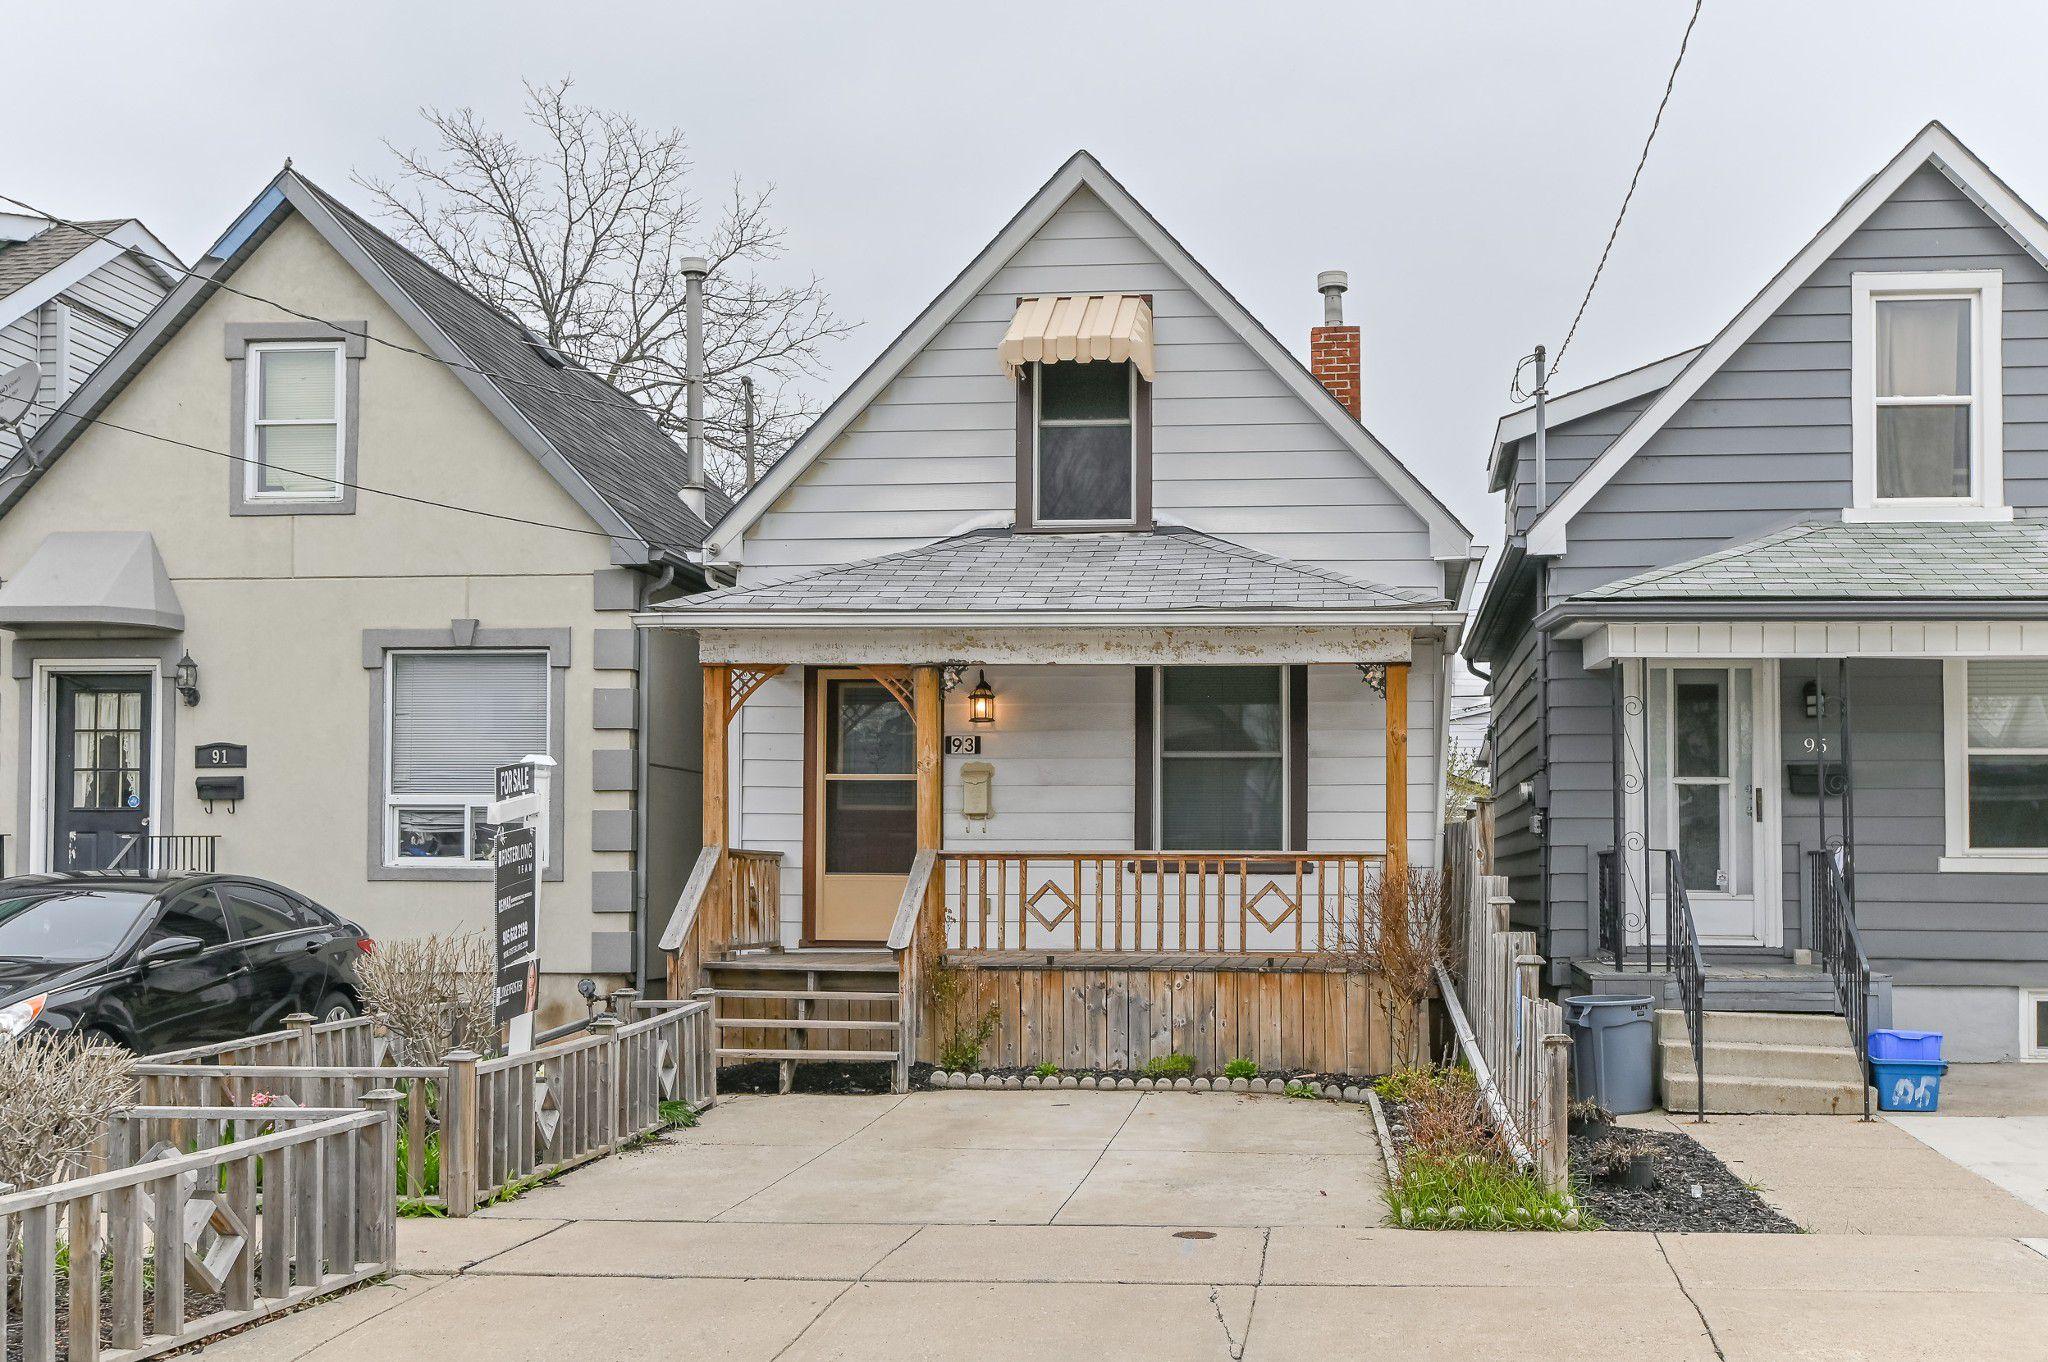 Main Photo: 93 Newlands Avenue in Hamilton: House for sale